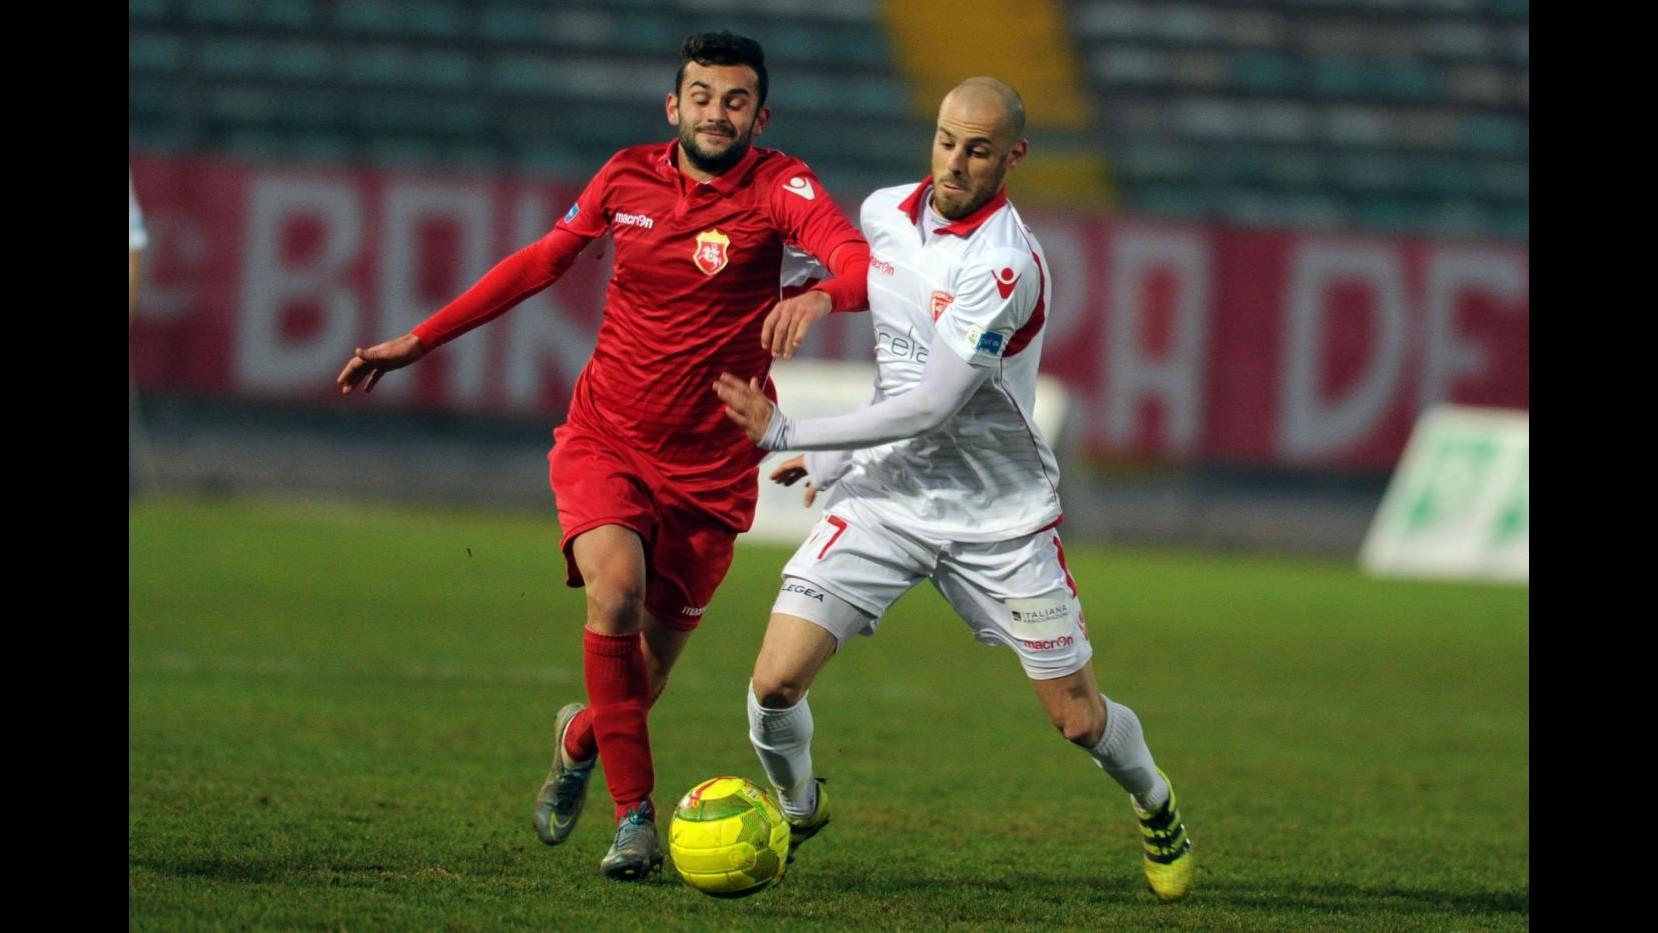 FOTO LegaPro, Ancona-Forlì 0-1